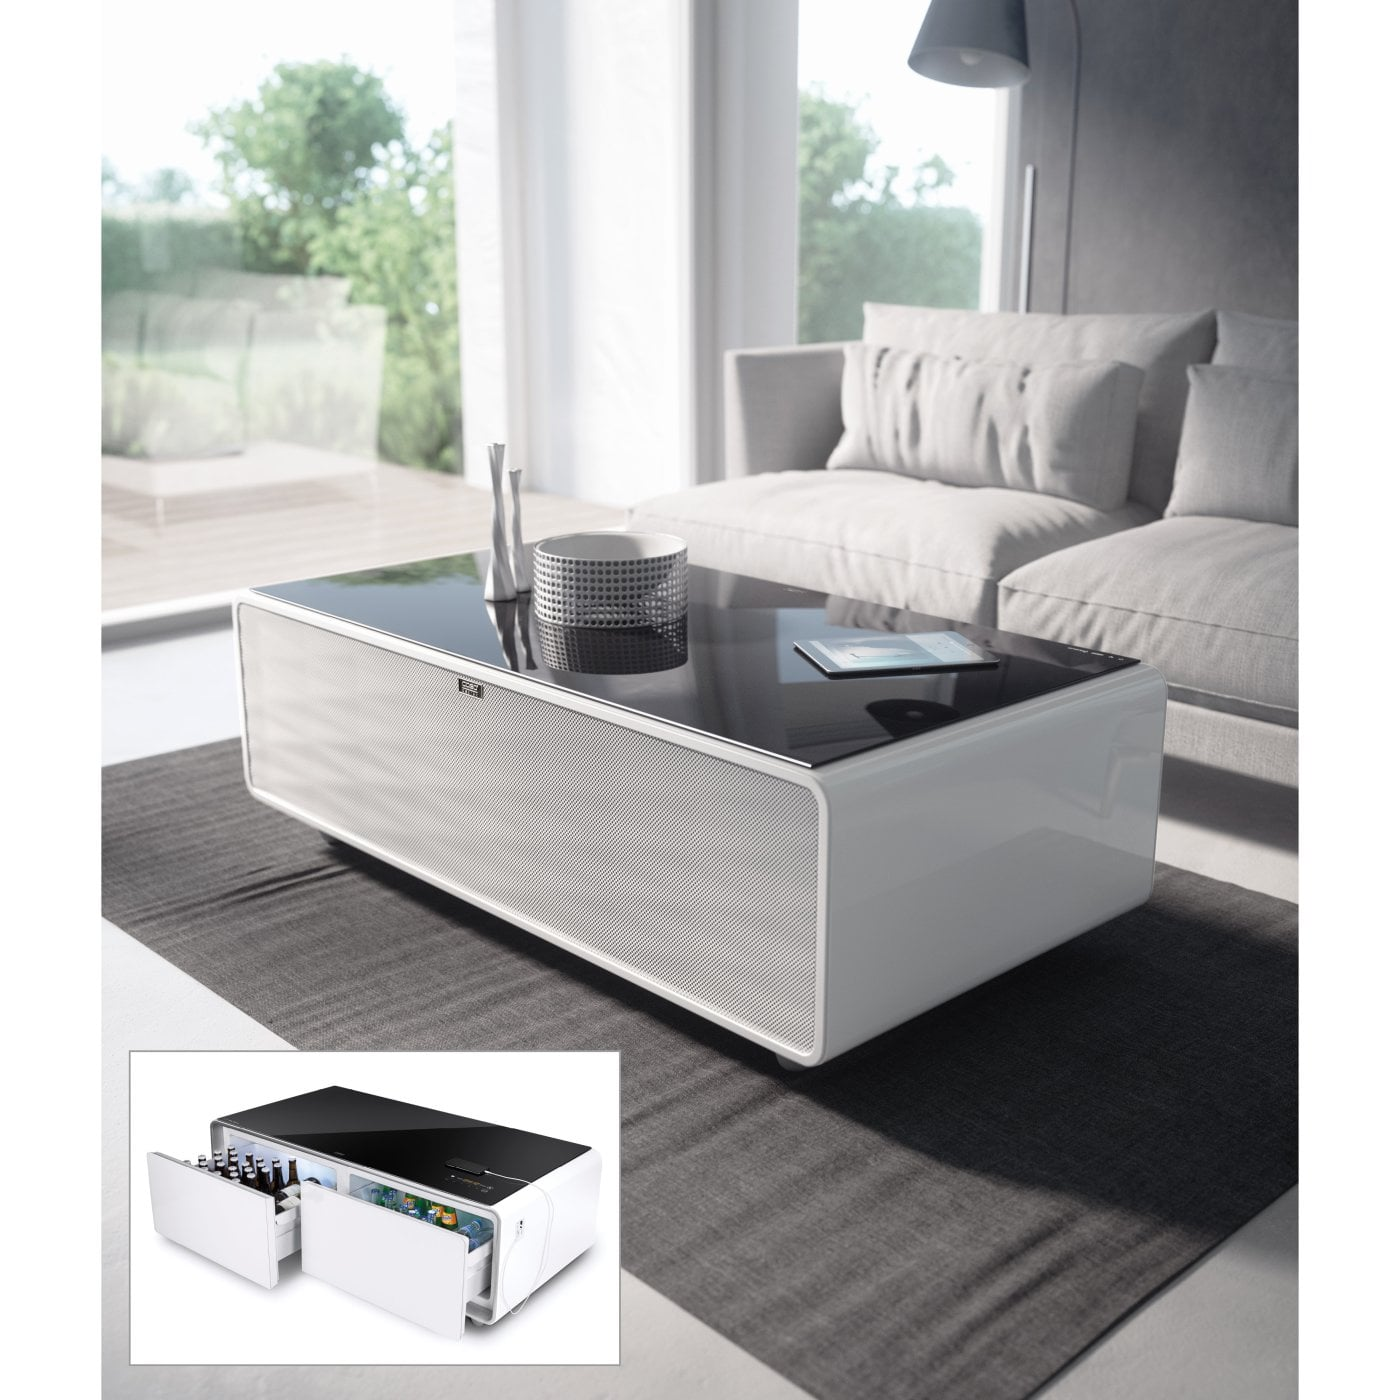 Marvelous Combination Of Soundbar Beverage Cooler Und Lounge Table Inzonedesignstudio Interior Chair Design Inzonedesignstudiocom